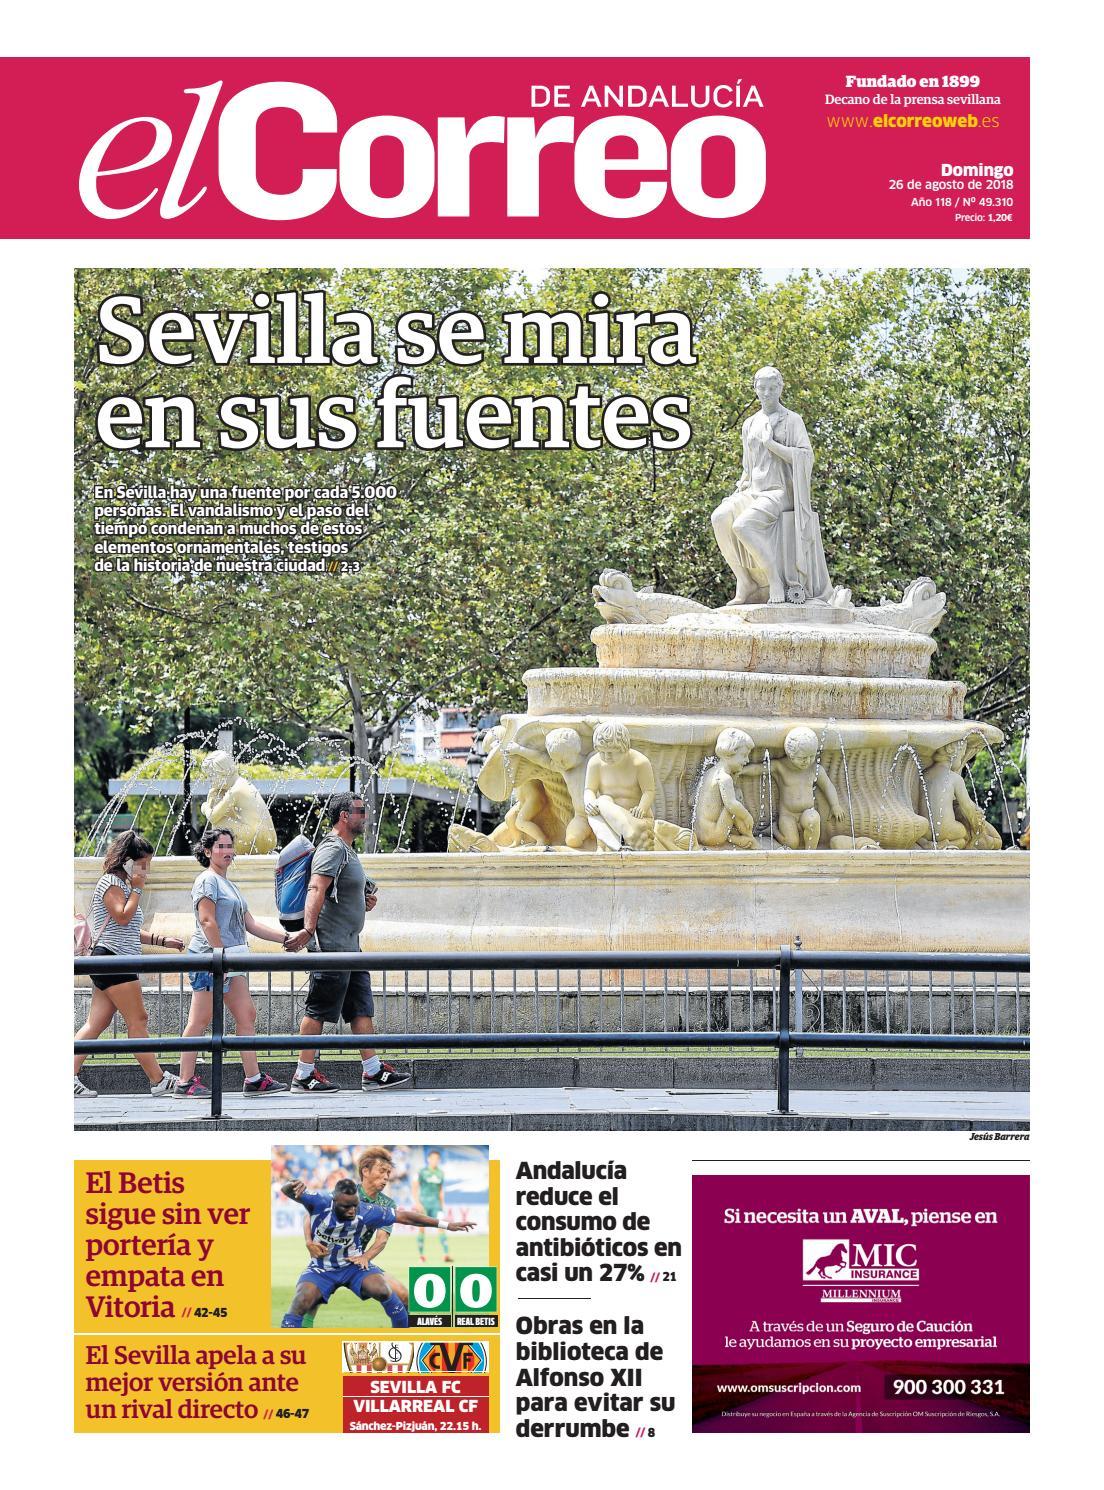 e4549f1322 26.08.2018 El Correo de Andalucía by EL CORREO DE ANDALUCÍA S.L. - issuu